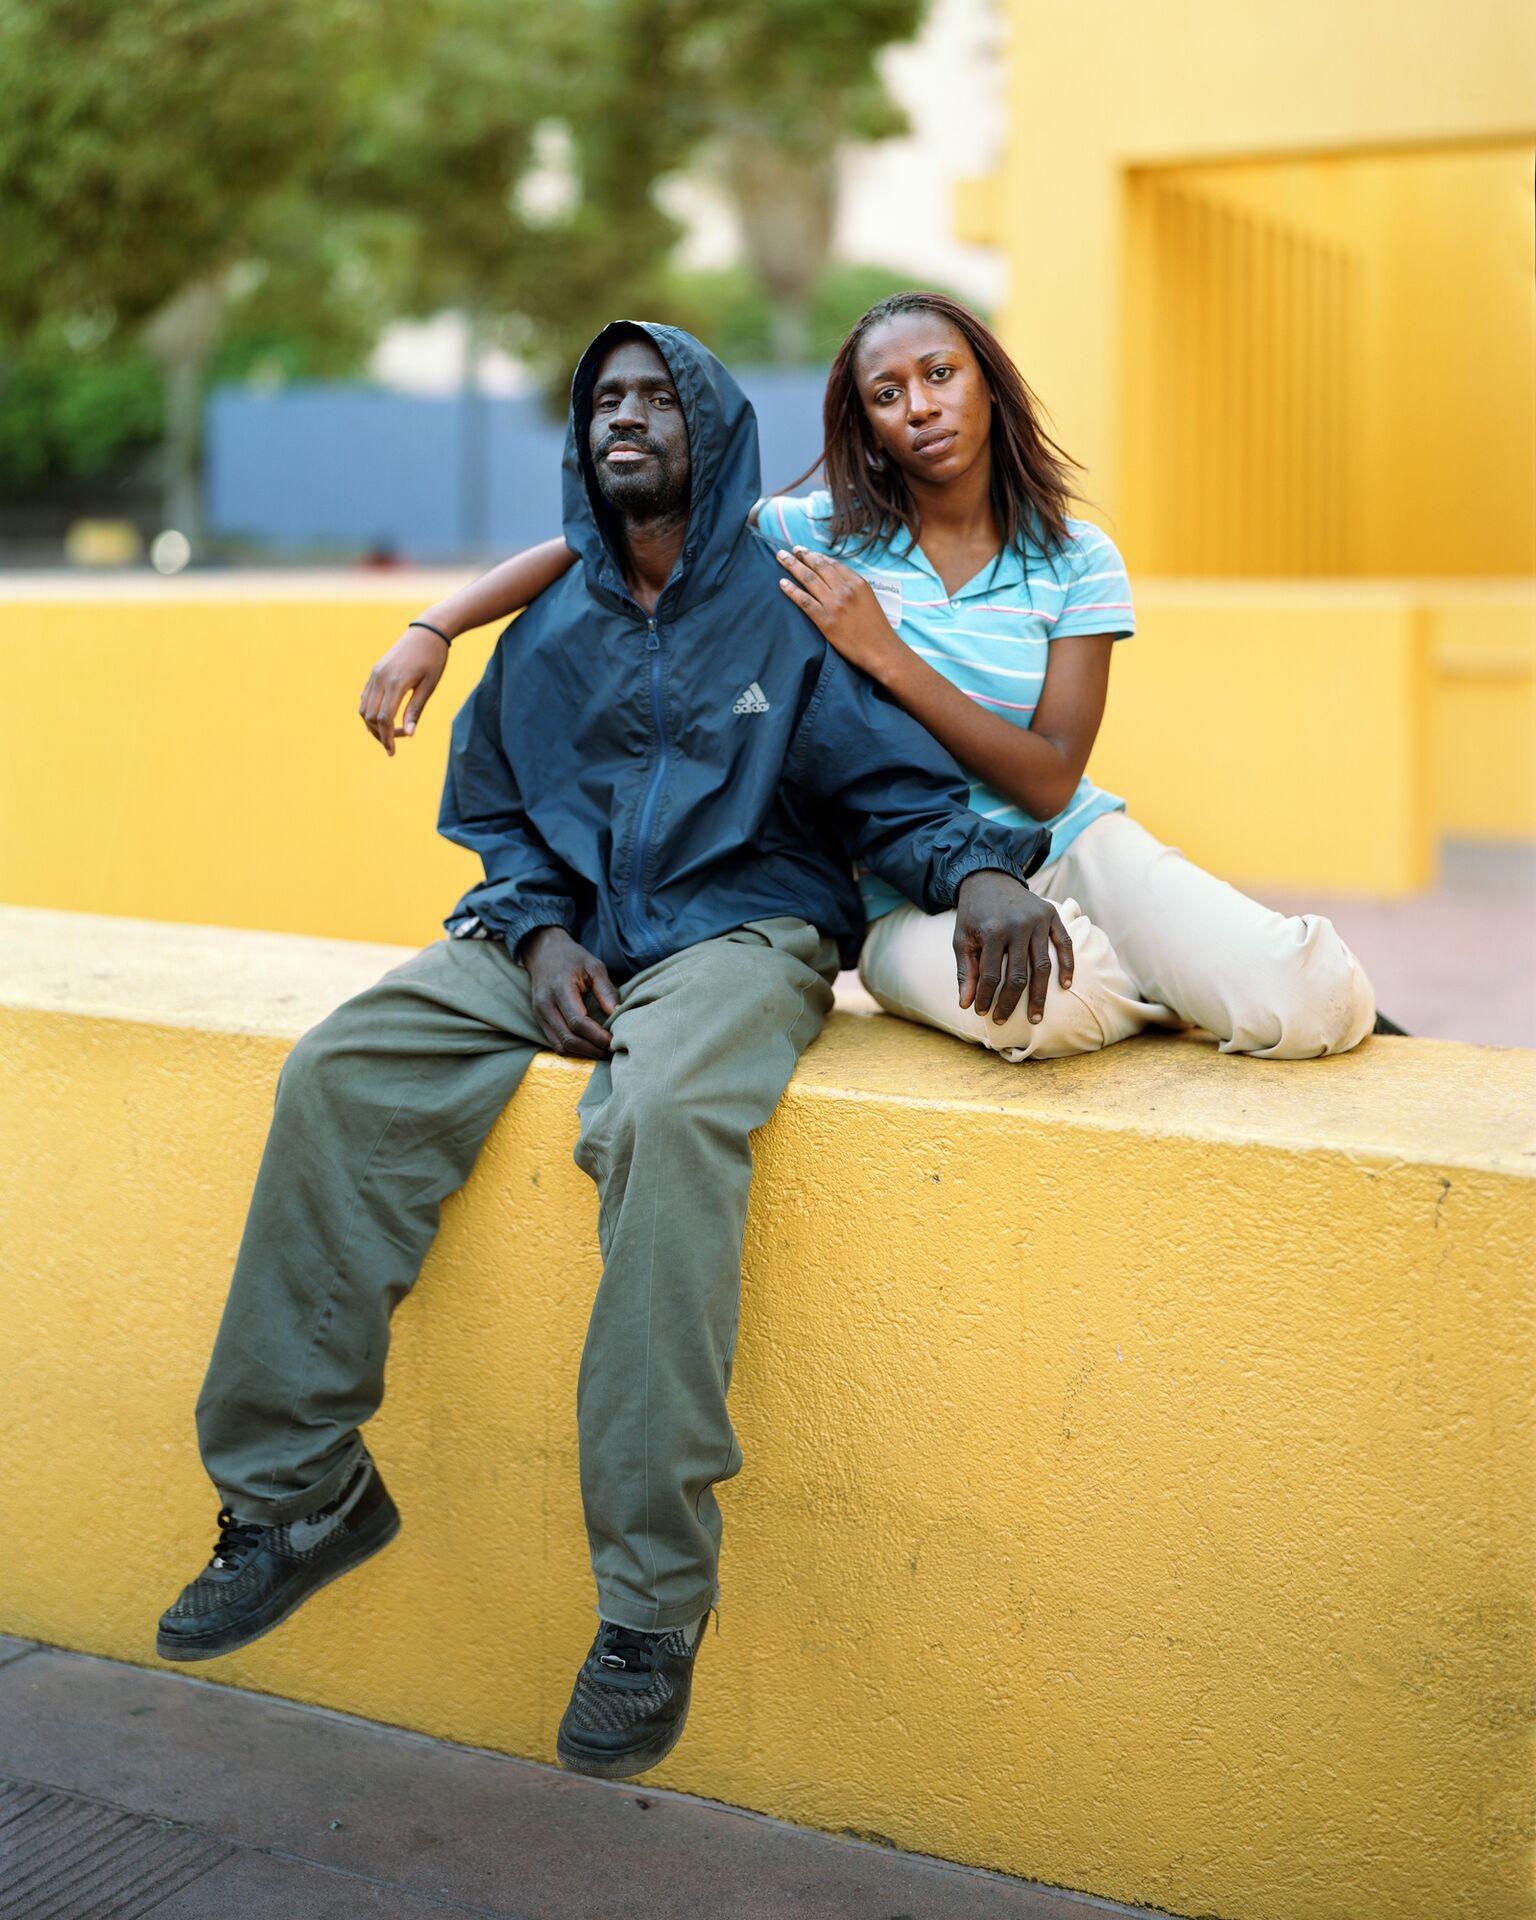 Richard Renaldi Reginald and Nicole, Los Angeles, CA, 2007, de la série Touching Strangers.Courtesy of the artist